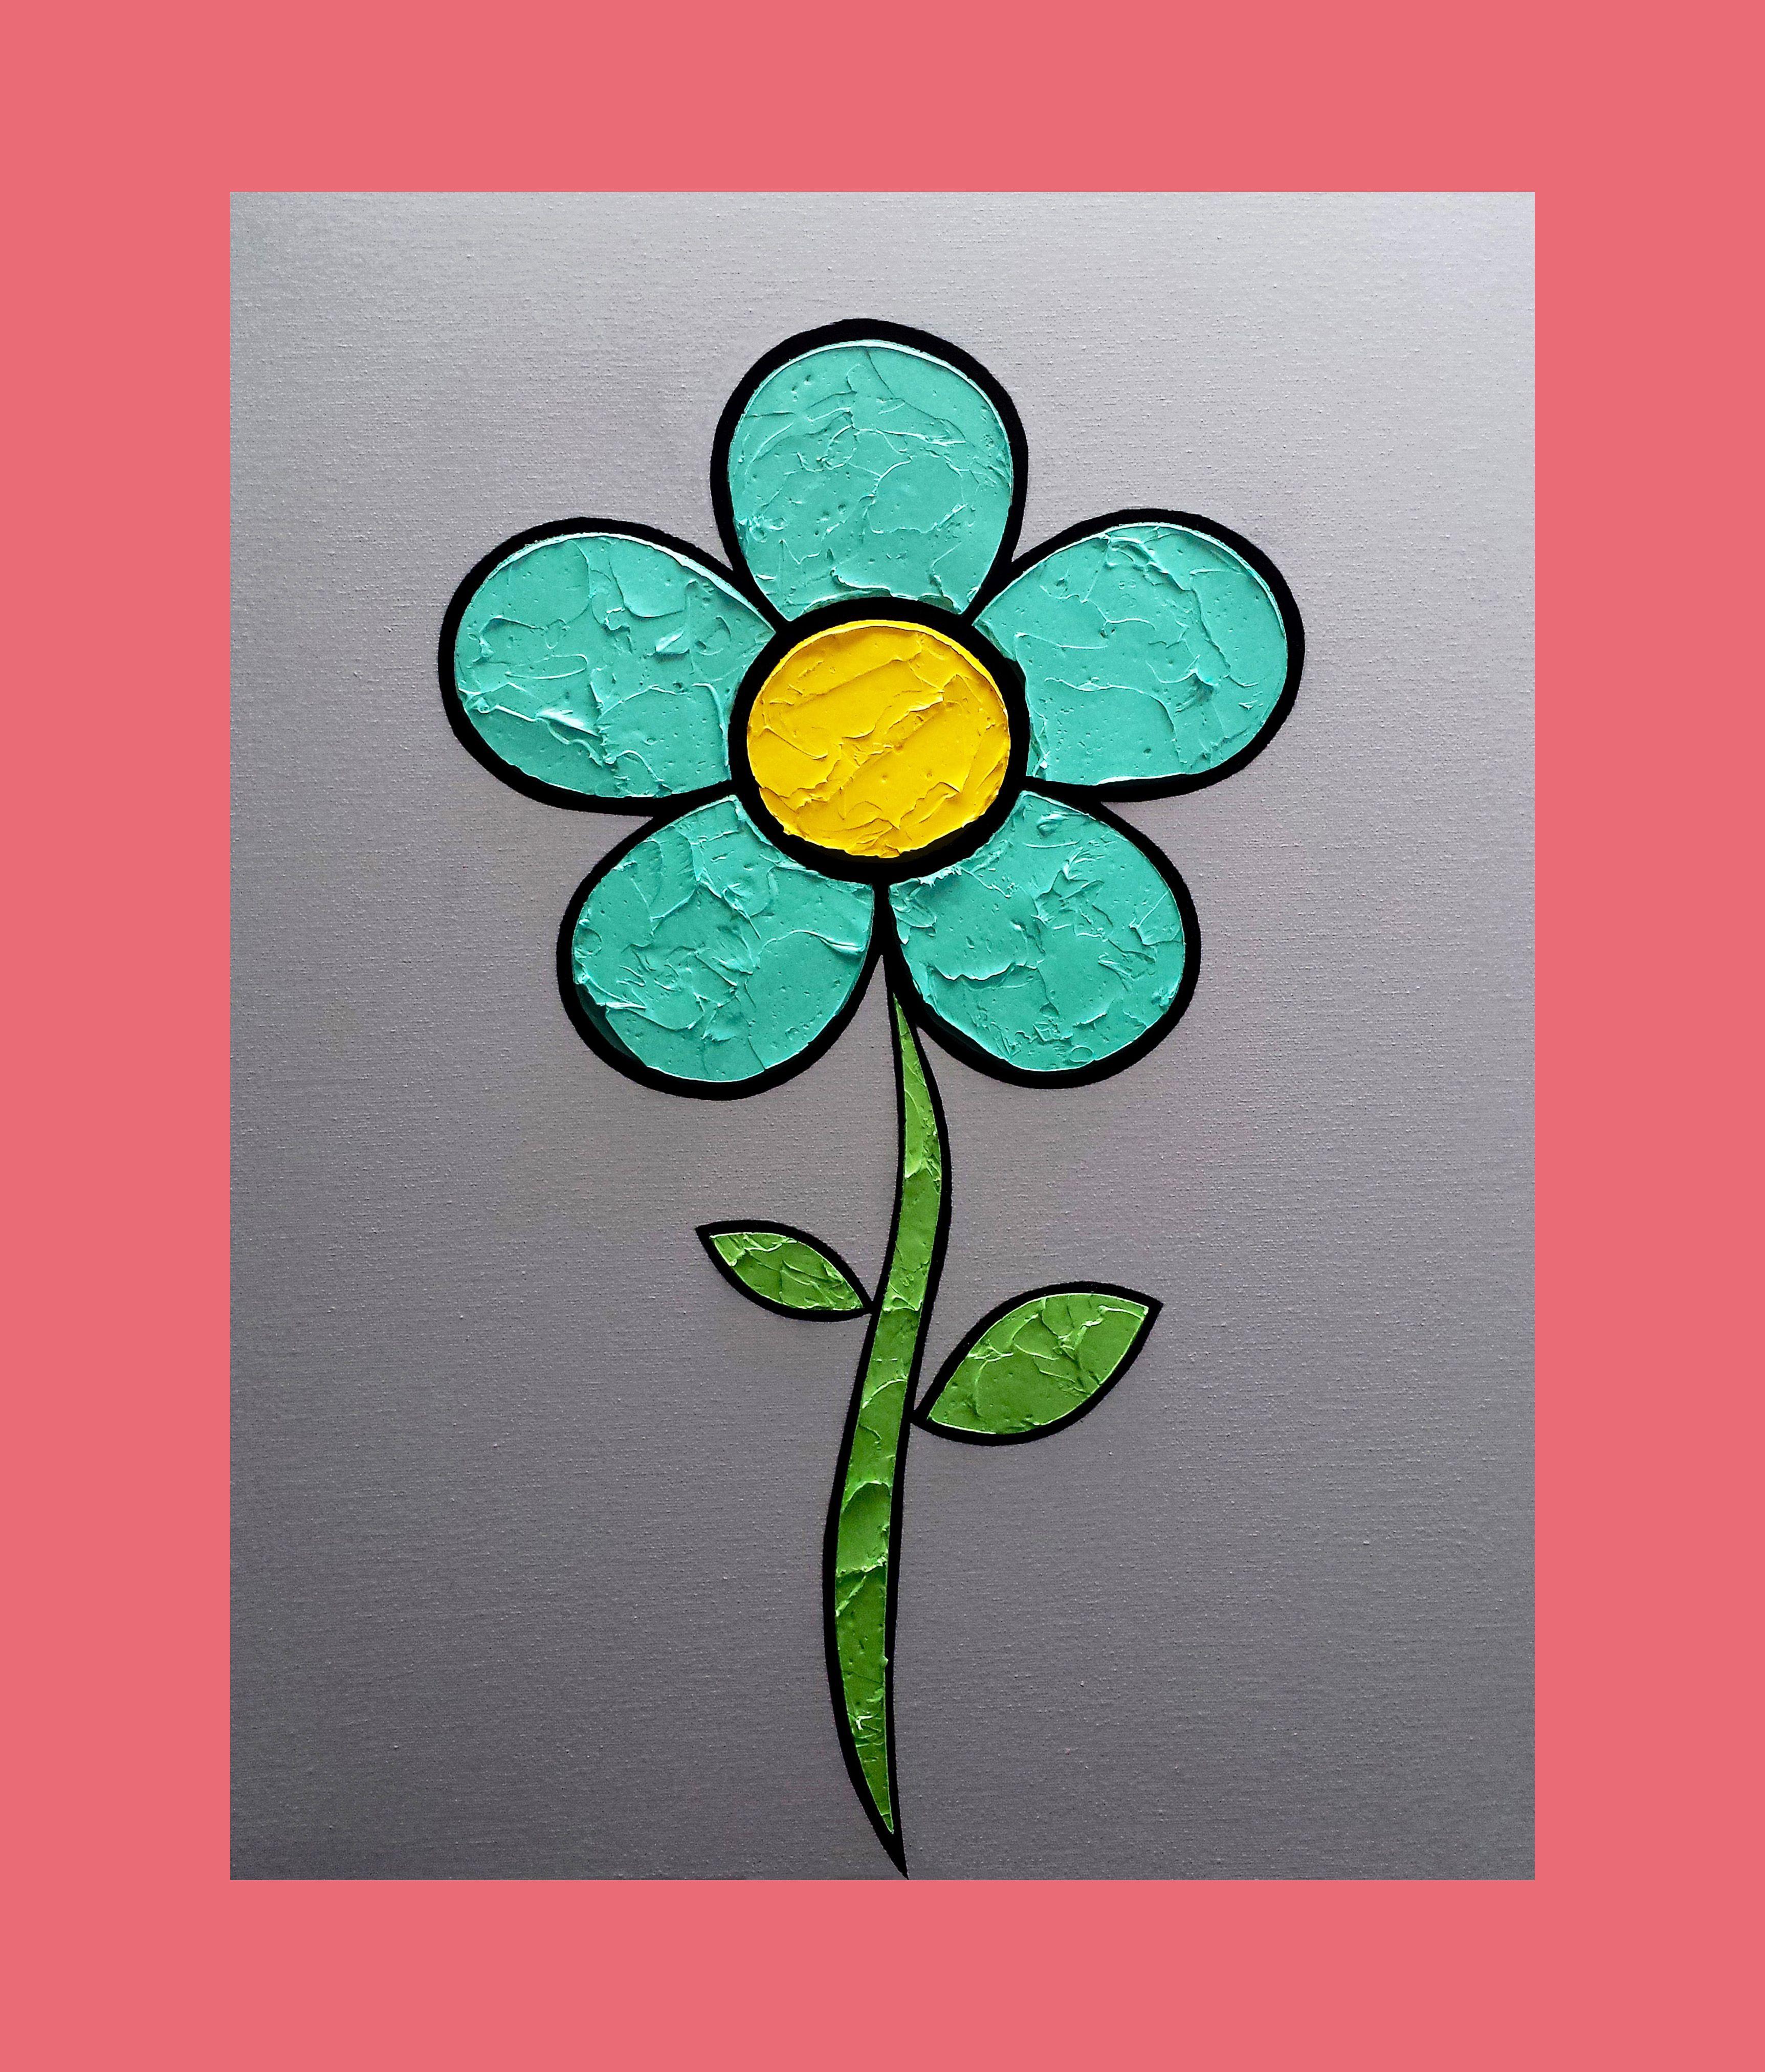 Flower 16 x 20 in. Canvas #LiteralPopArt #PopArt #Art #Flowers #Petals #Nature #Garden Organic #Green #GoingGreen #Turquoise #MichaelCrayola #2017